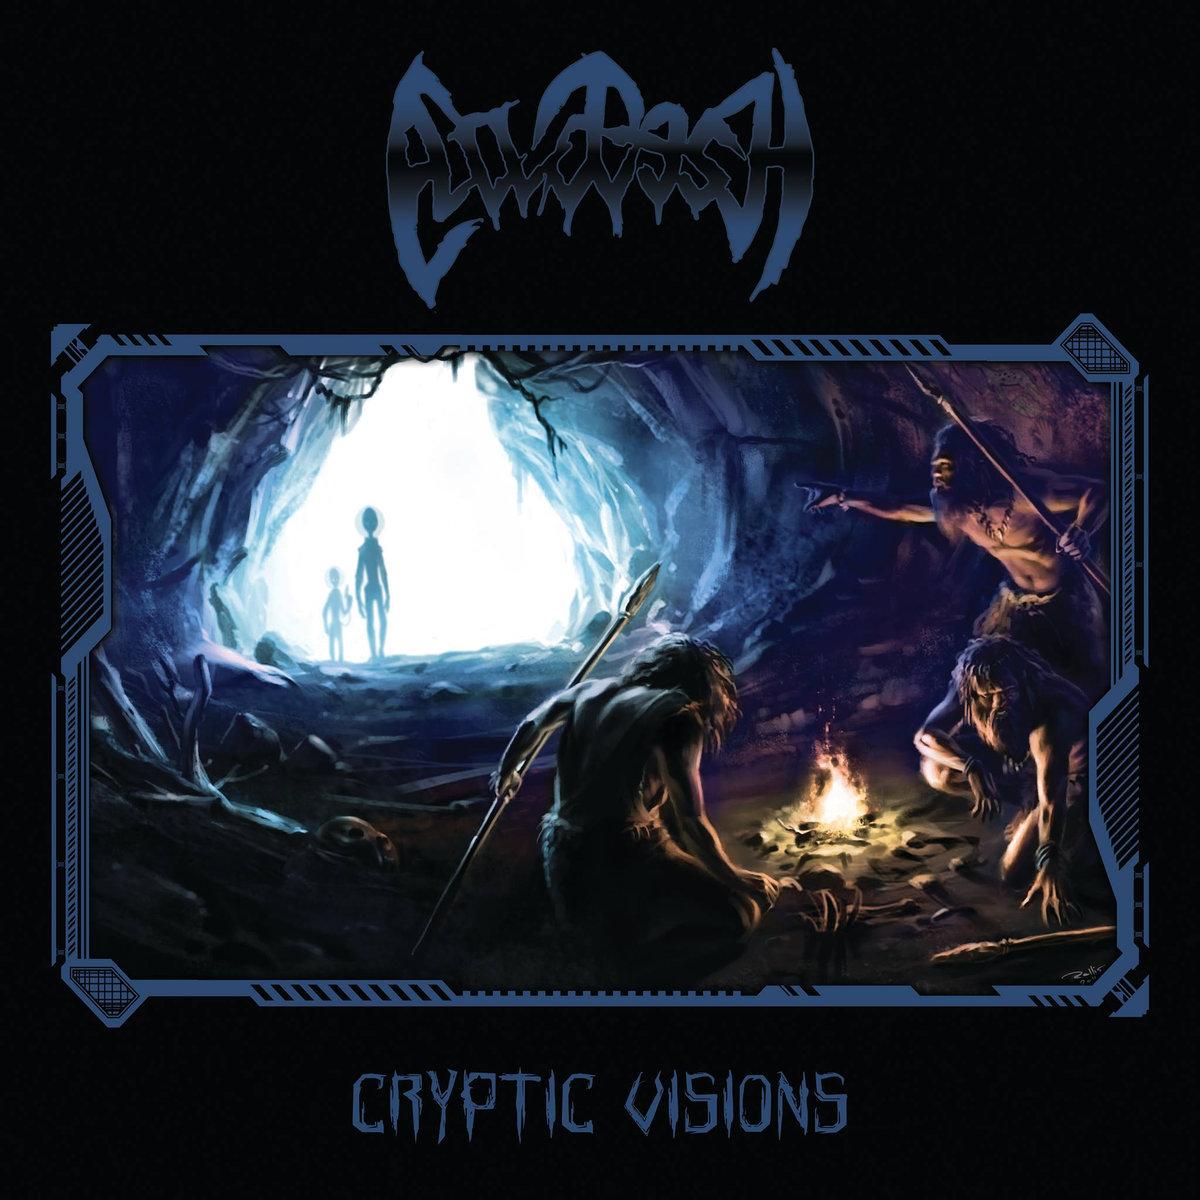 cryptic visions artwork.jpg